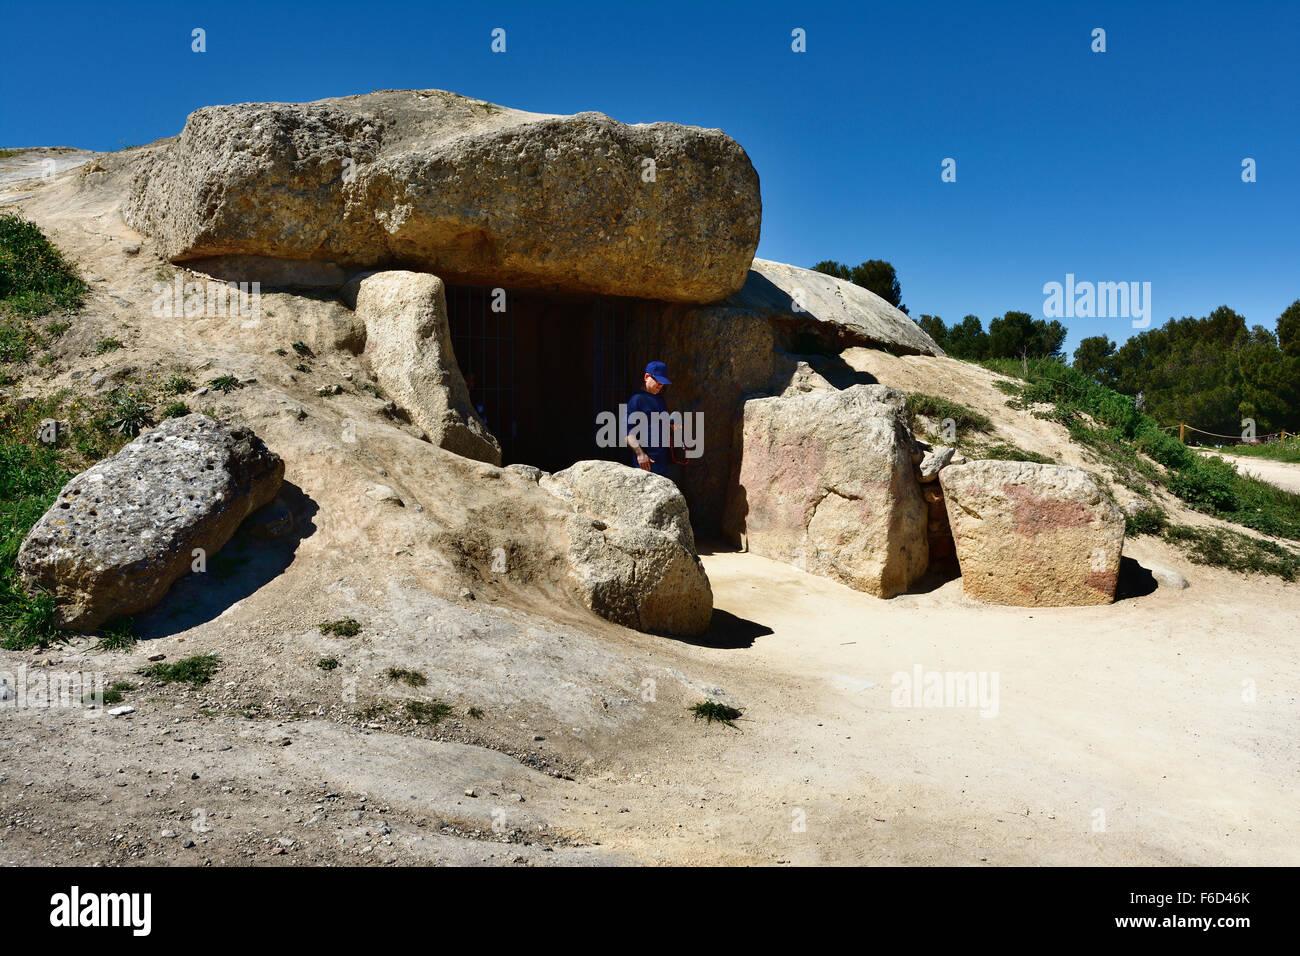 The Dolmen of Menga. Antequera. Malaga. Spain - Stock Image